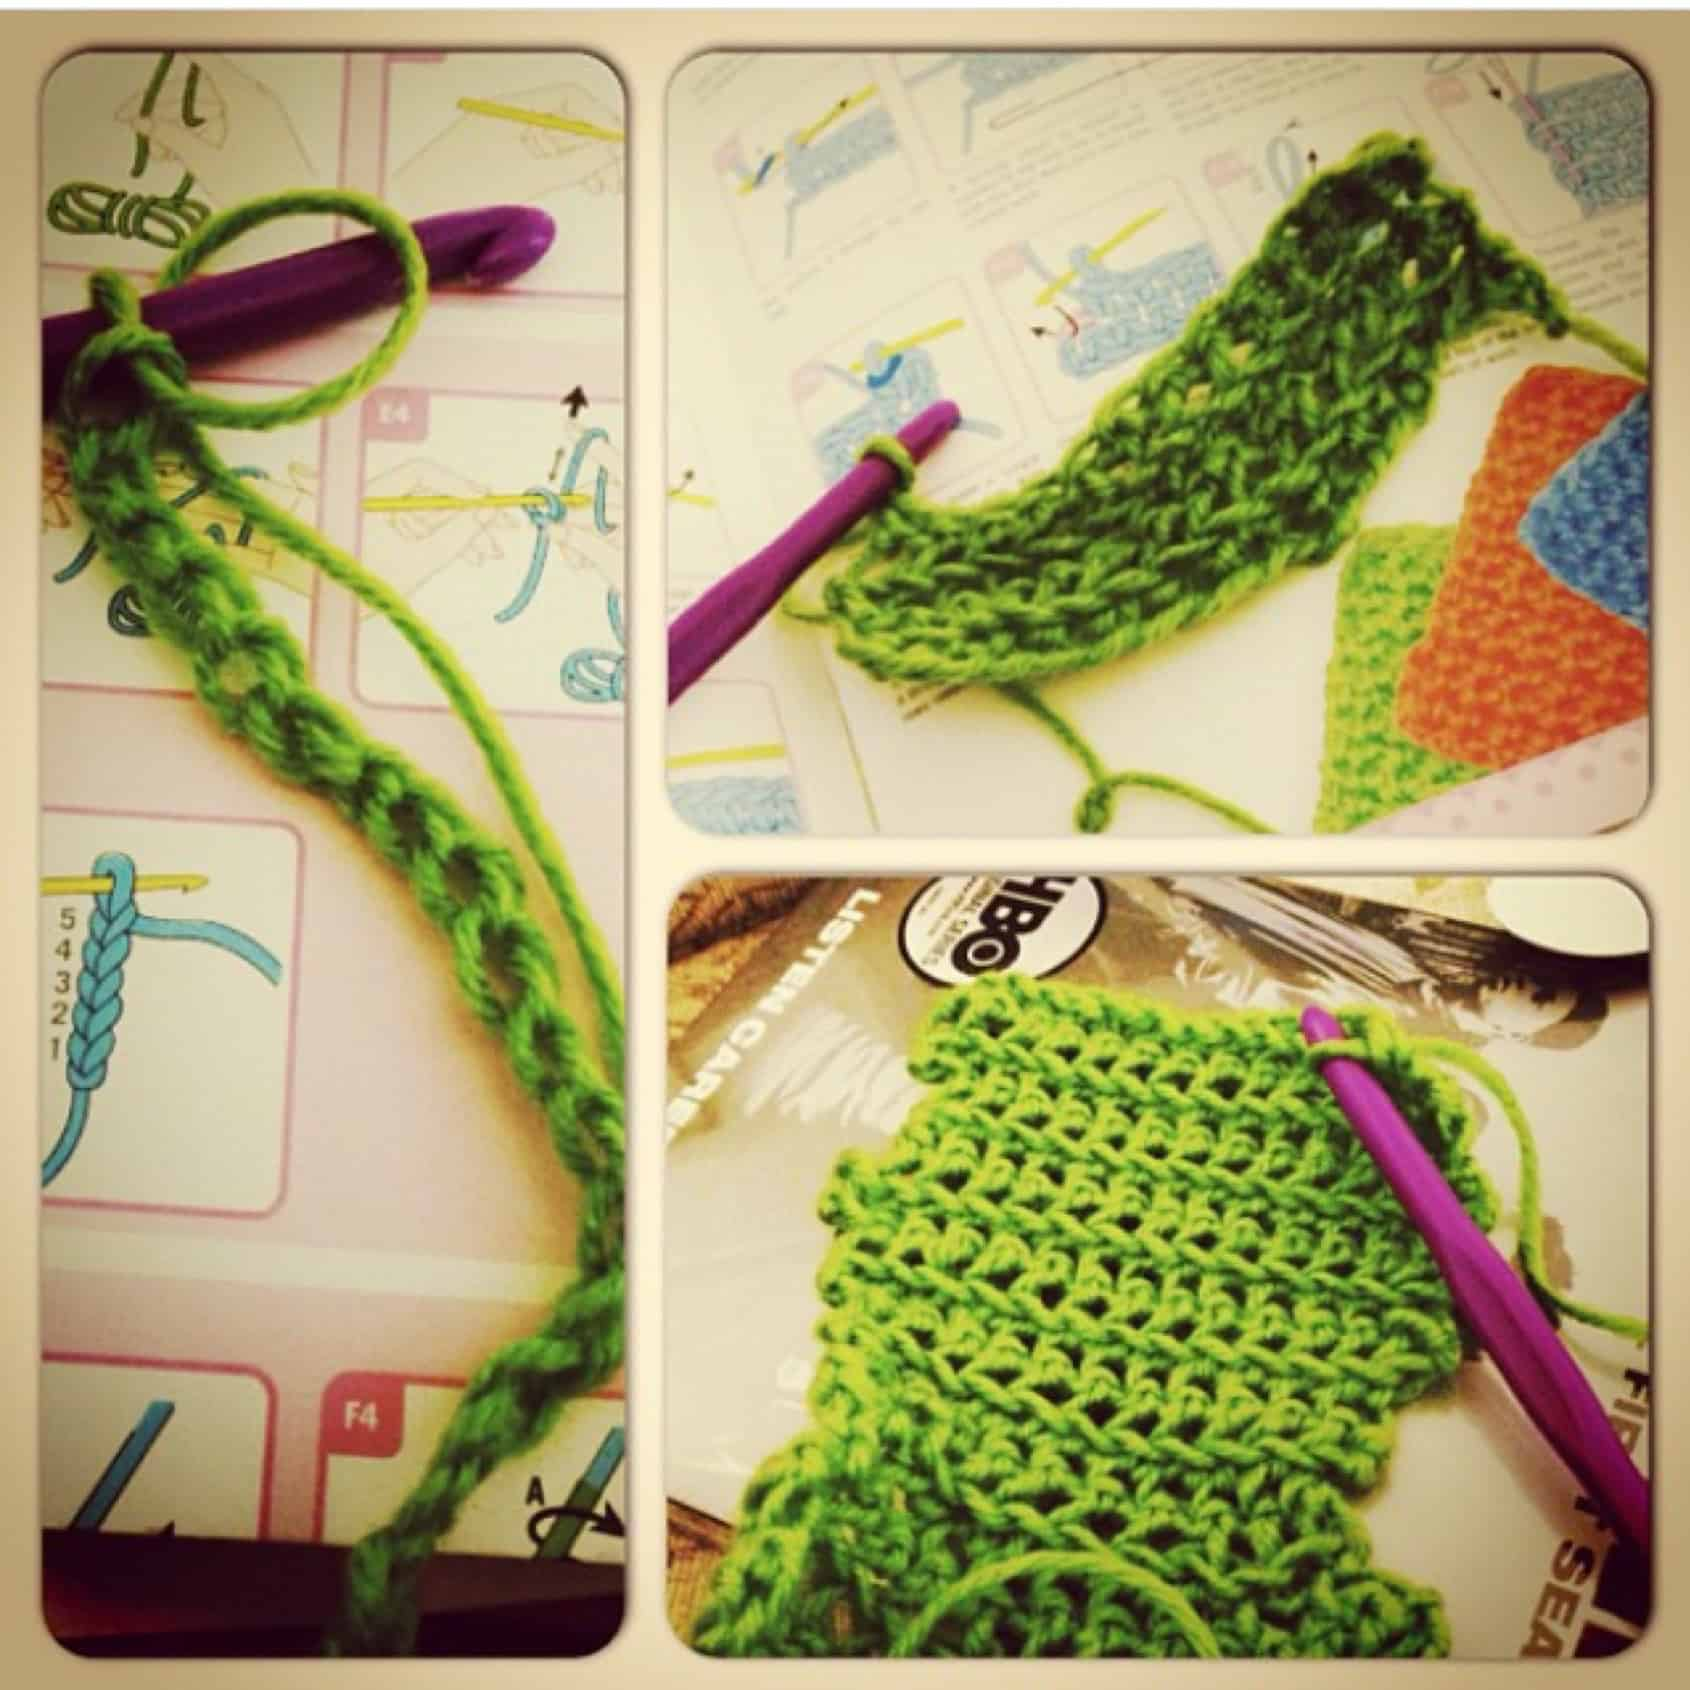 First attempt at crochet